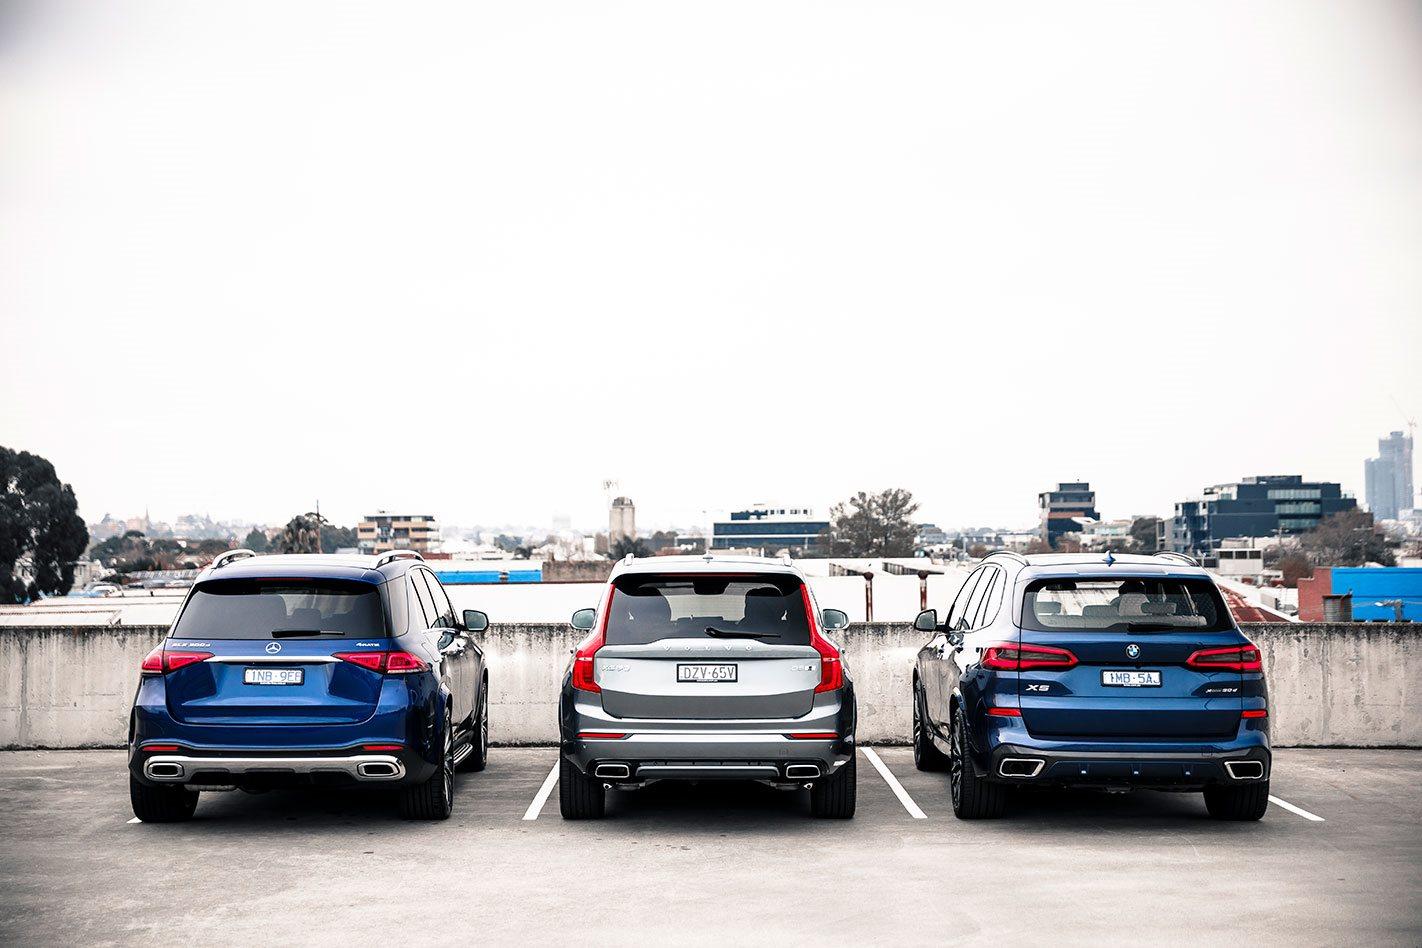 Bmw X5 Vs Mercedes Benz Gle Vs Volvo Xc90 Comparison